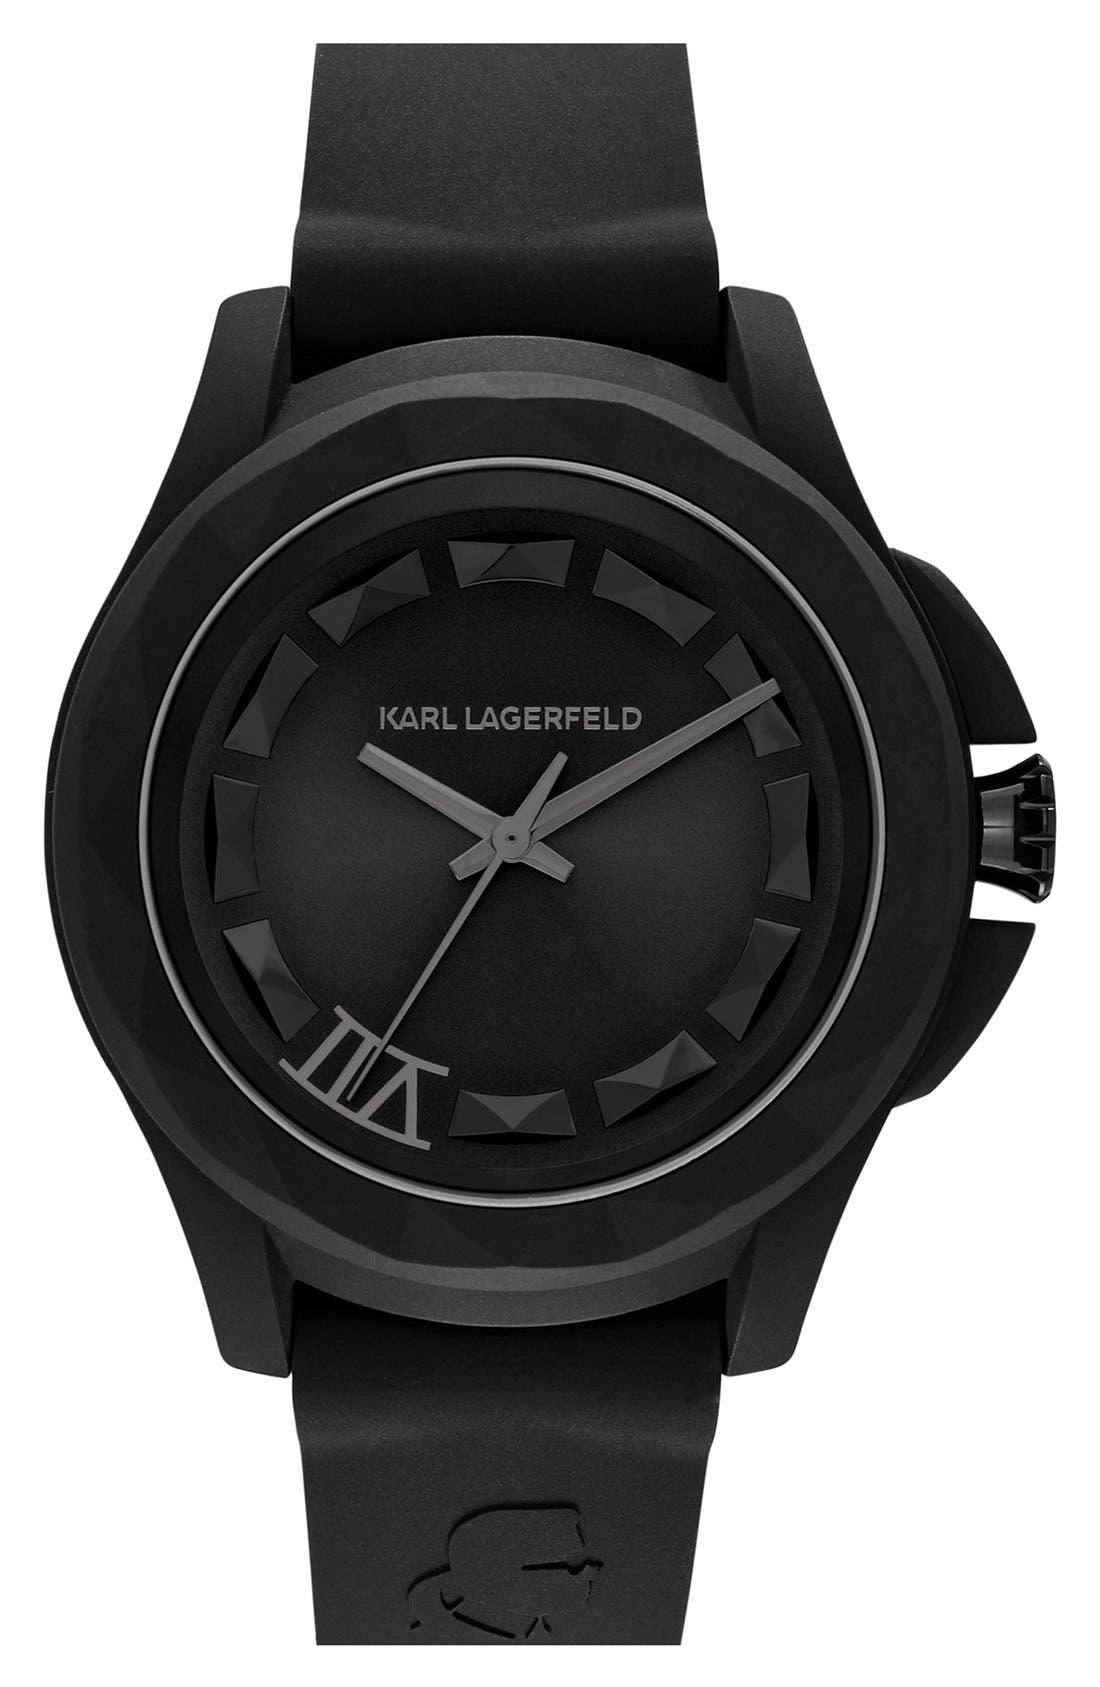 Main Image - KARL LAGERFELD '7' Beveled Bezel Silicone Strap Watch, 44mm